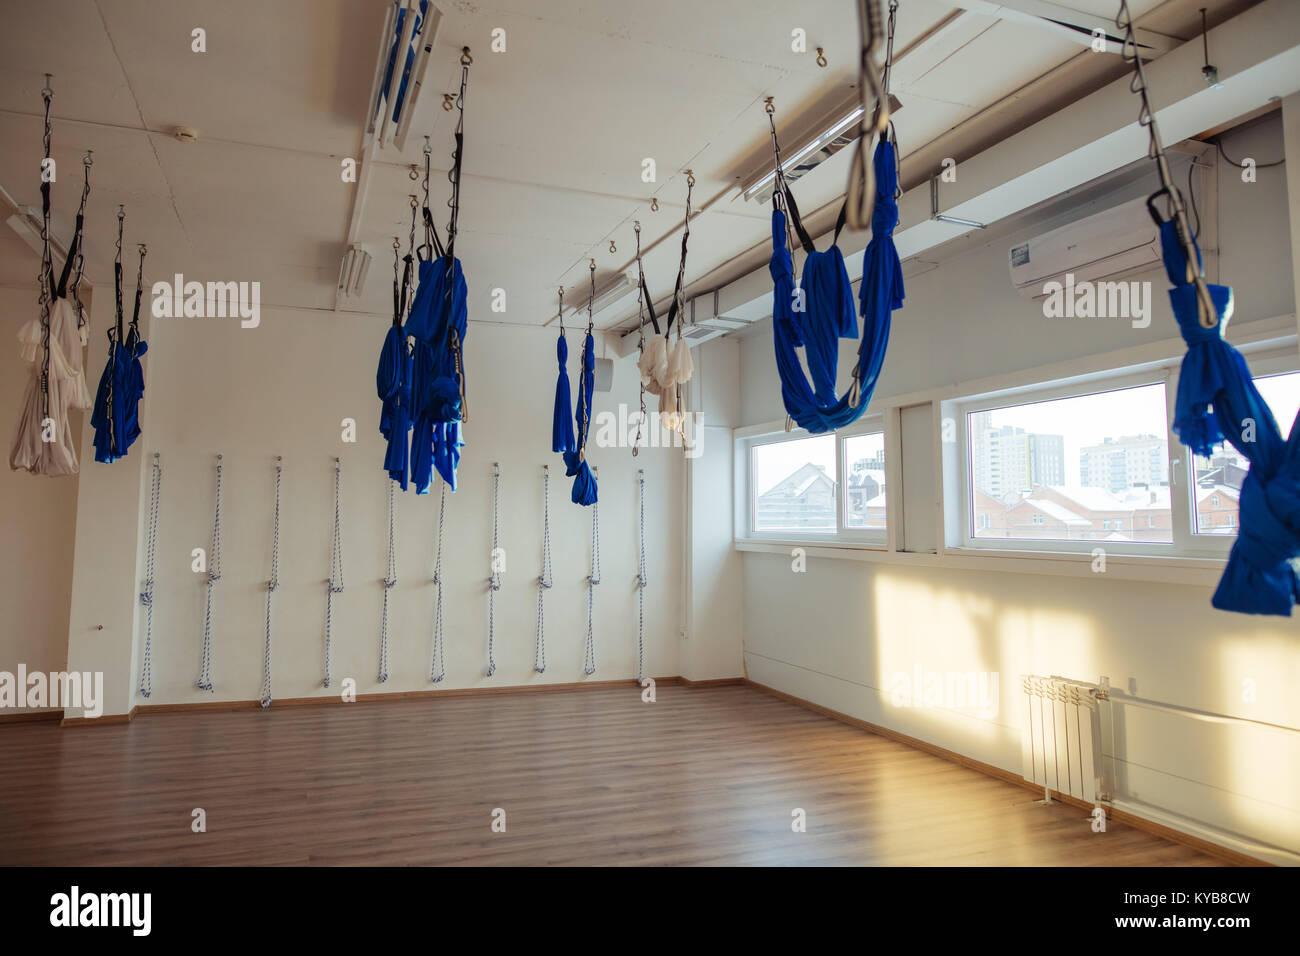 Hanging hammocks in gym for aerial anti-gravity yoga - Stock Image